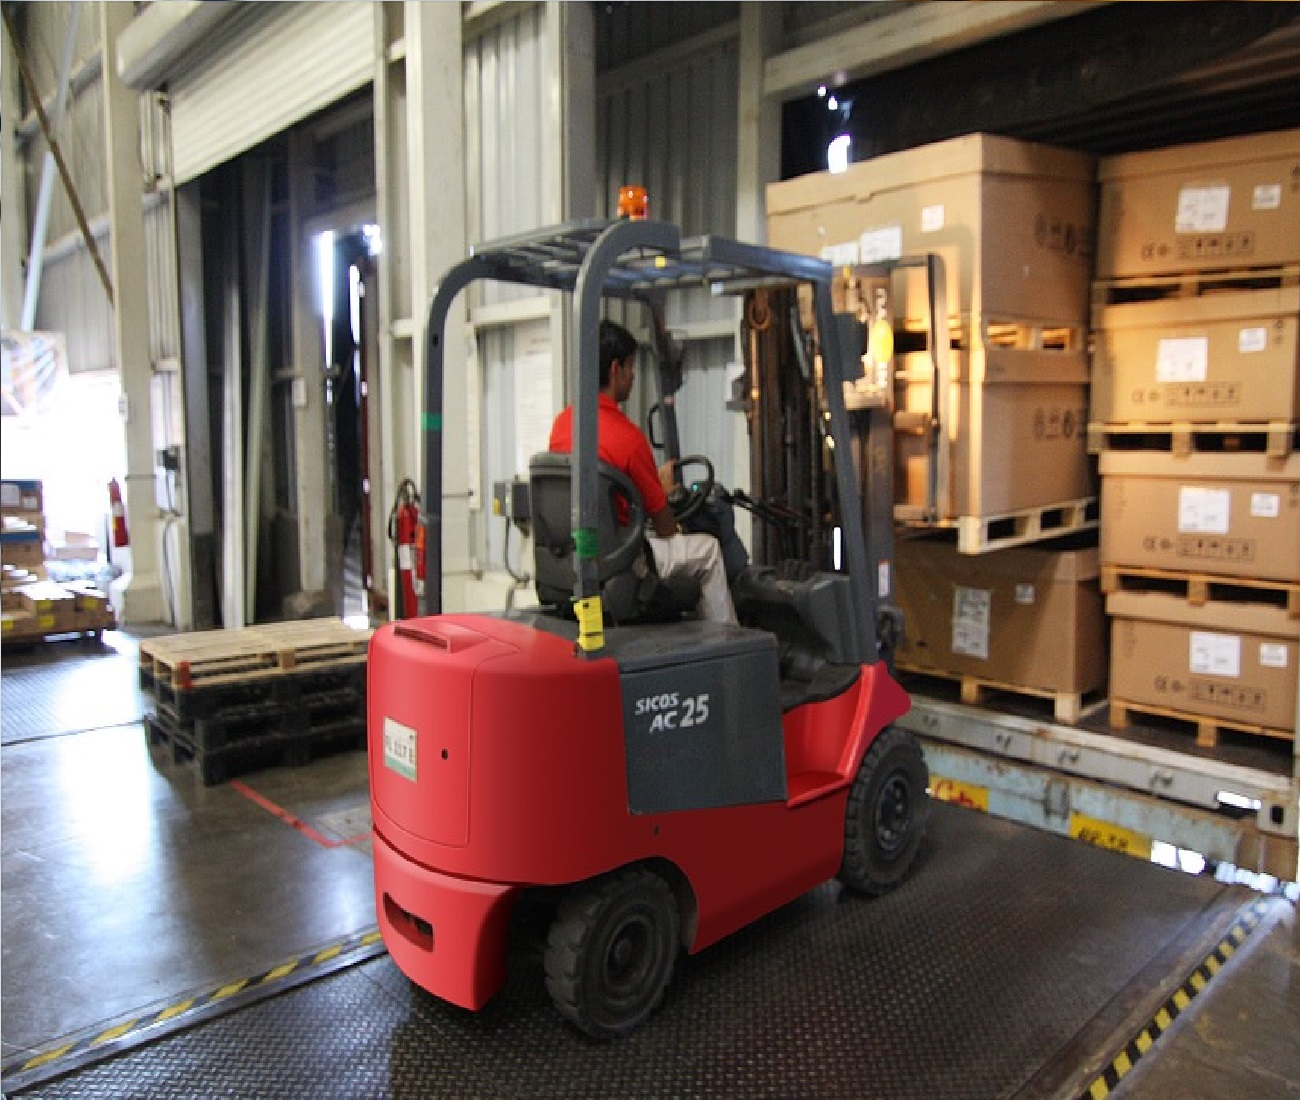 Forklift Travel Safety Tool